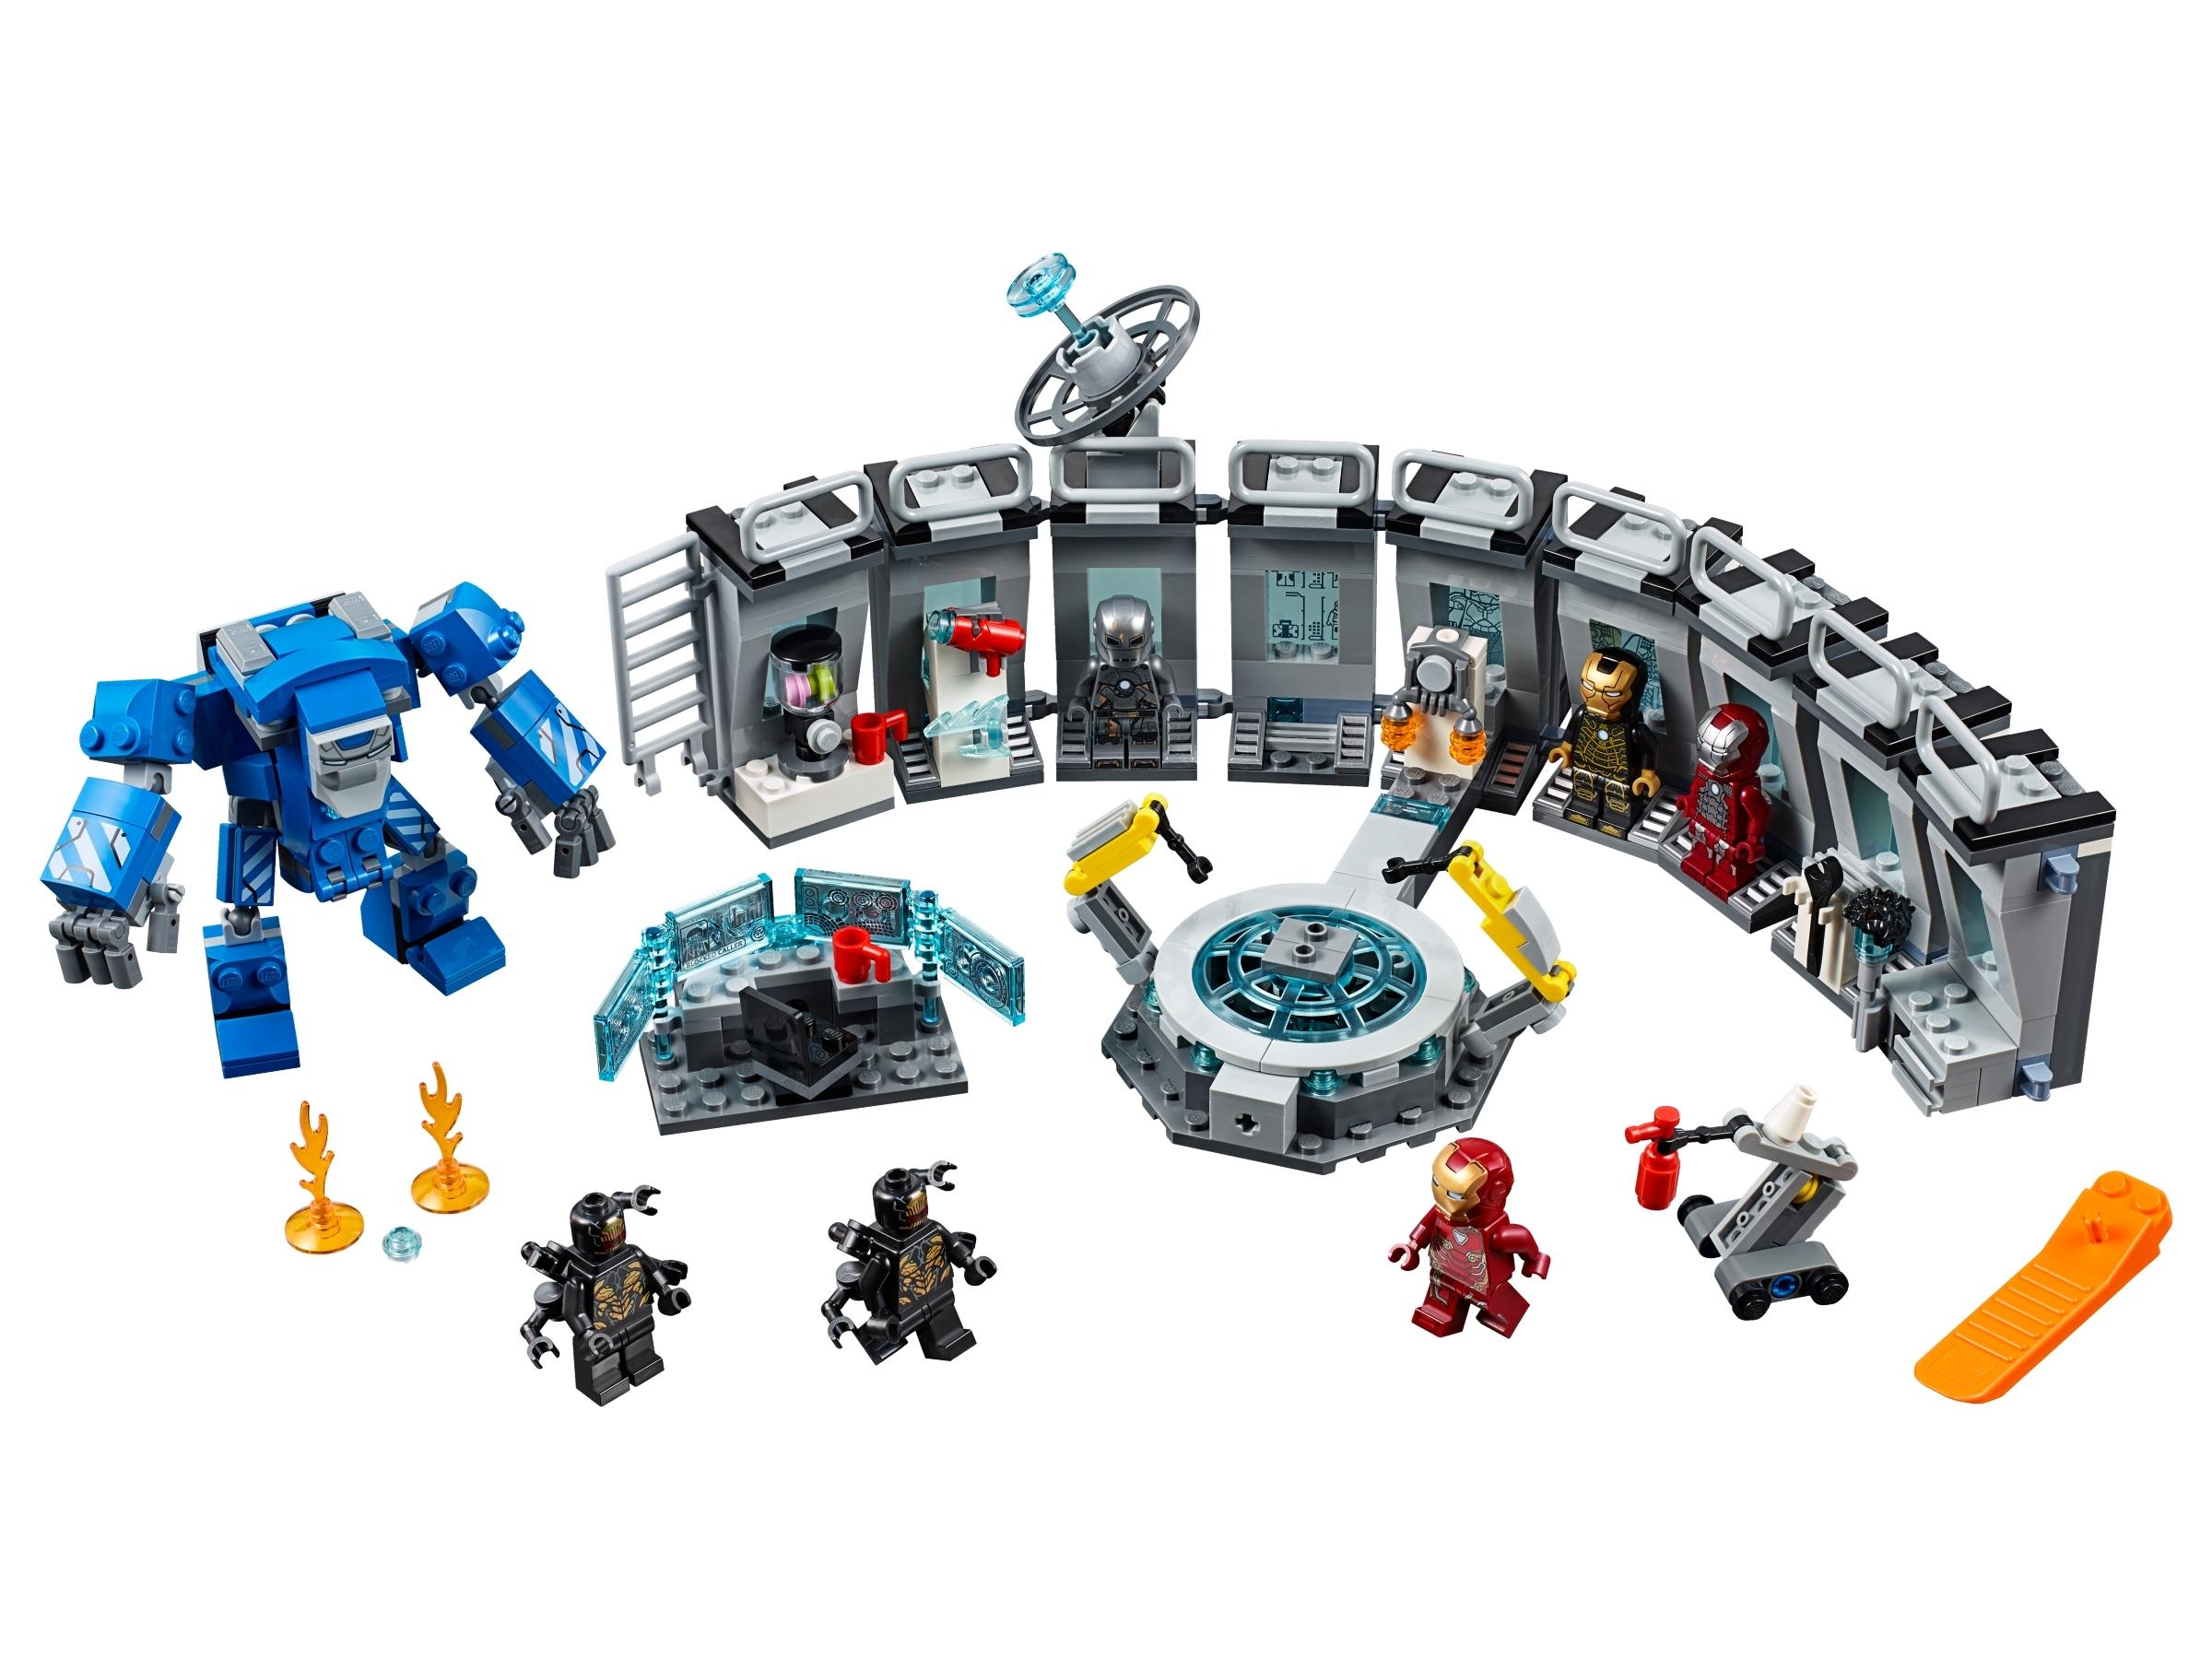 LEGO Avengers Endgame Iron Man Mark 41 Armor Minifigure 76125 Mini Fig